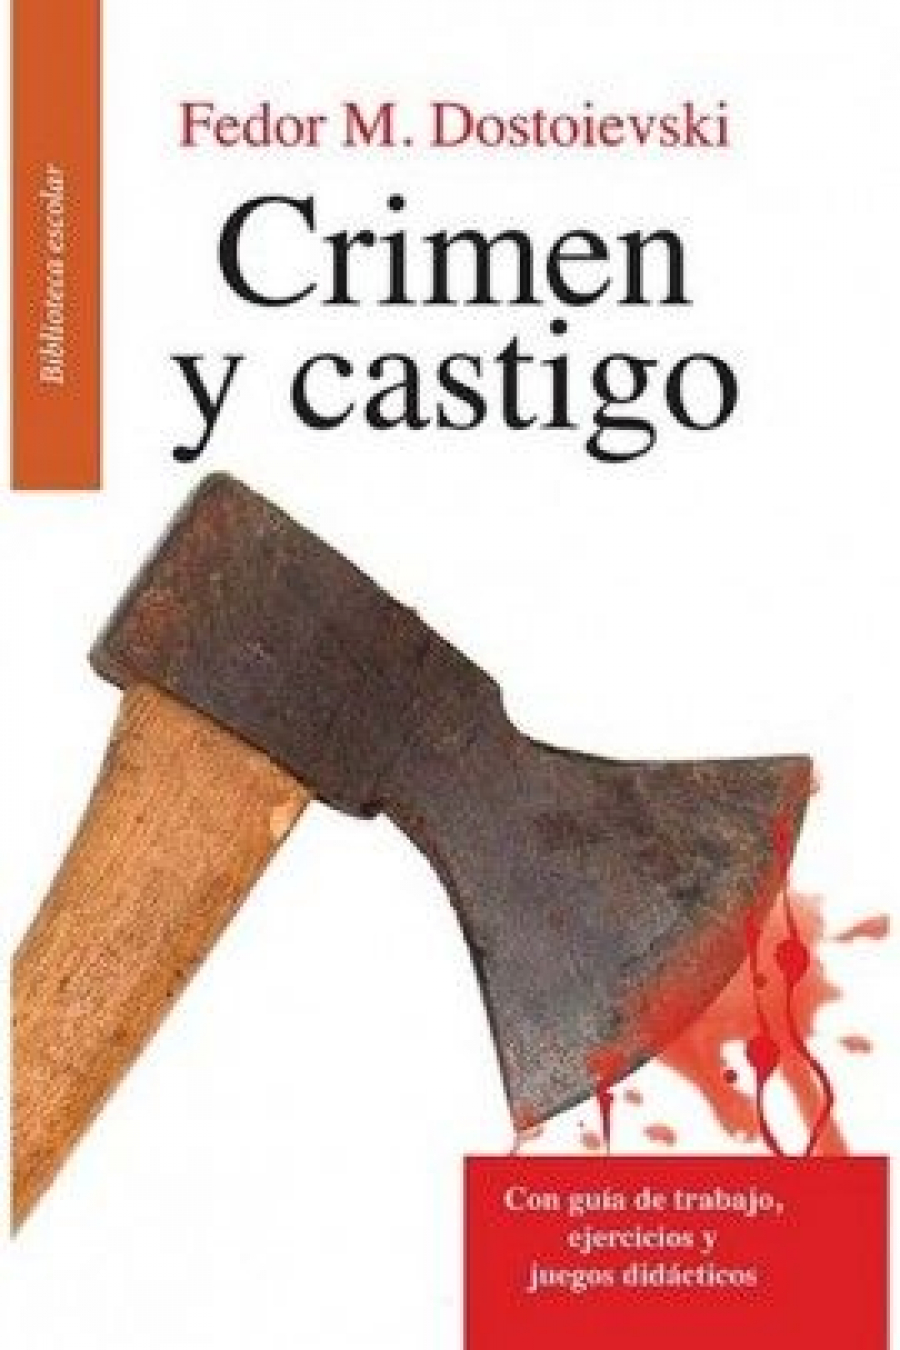 Crimen Y Castigo Pdf Fiódor Dostoievski Liankas Descarga De Libros Pdf